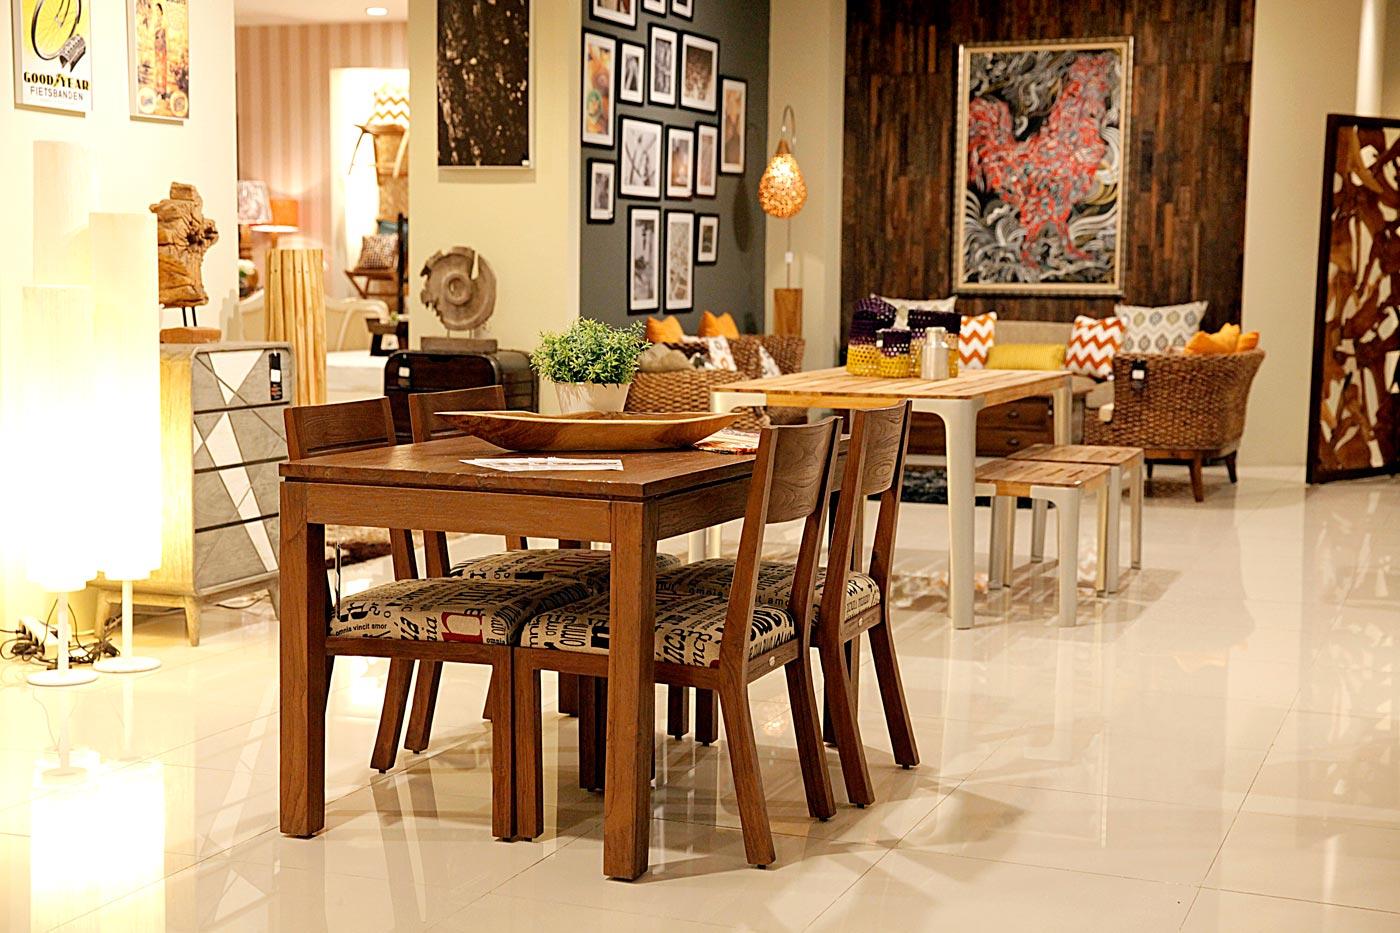 100 Hotel Furniture Suppliers U0026 Contract Kwalu Healthcare U0026 Senior Living Furniture